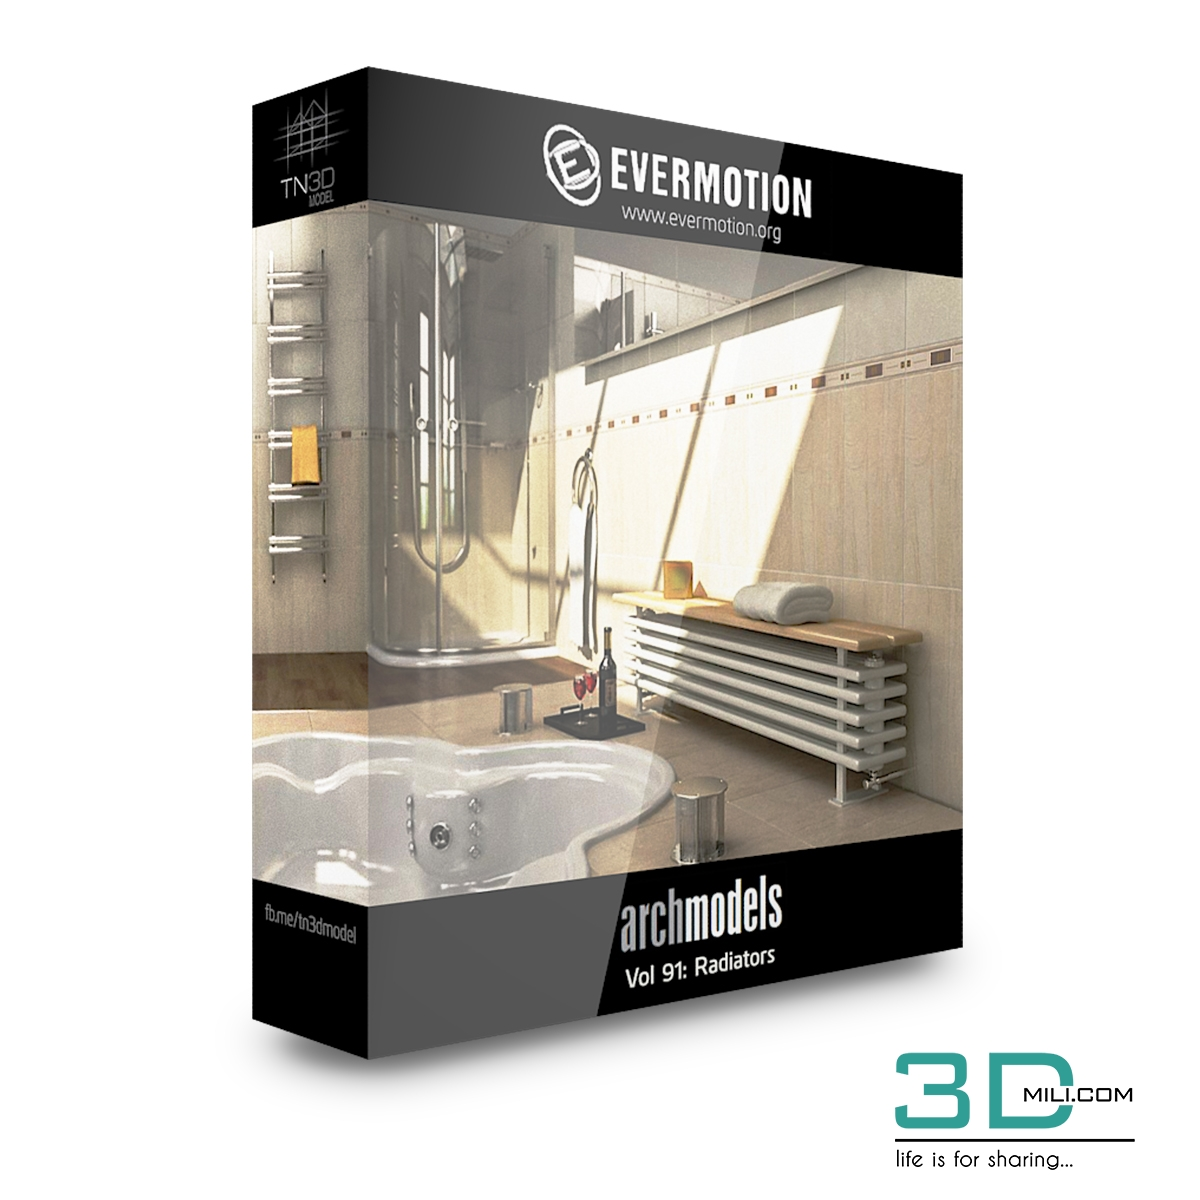 Evermotion Archmodels Vol 91: Radiators - 3D Mili - Download 3D